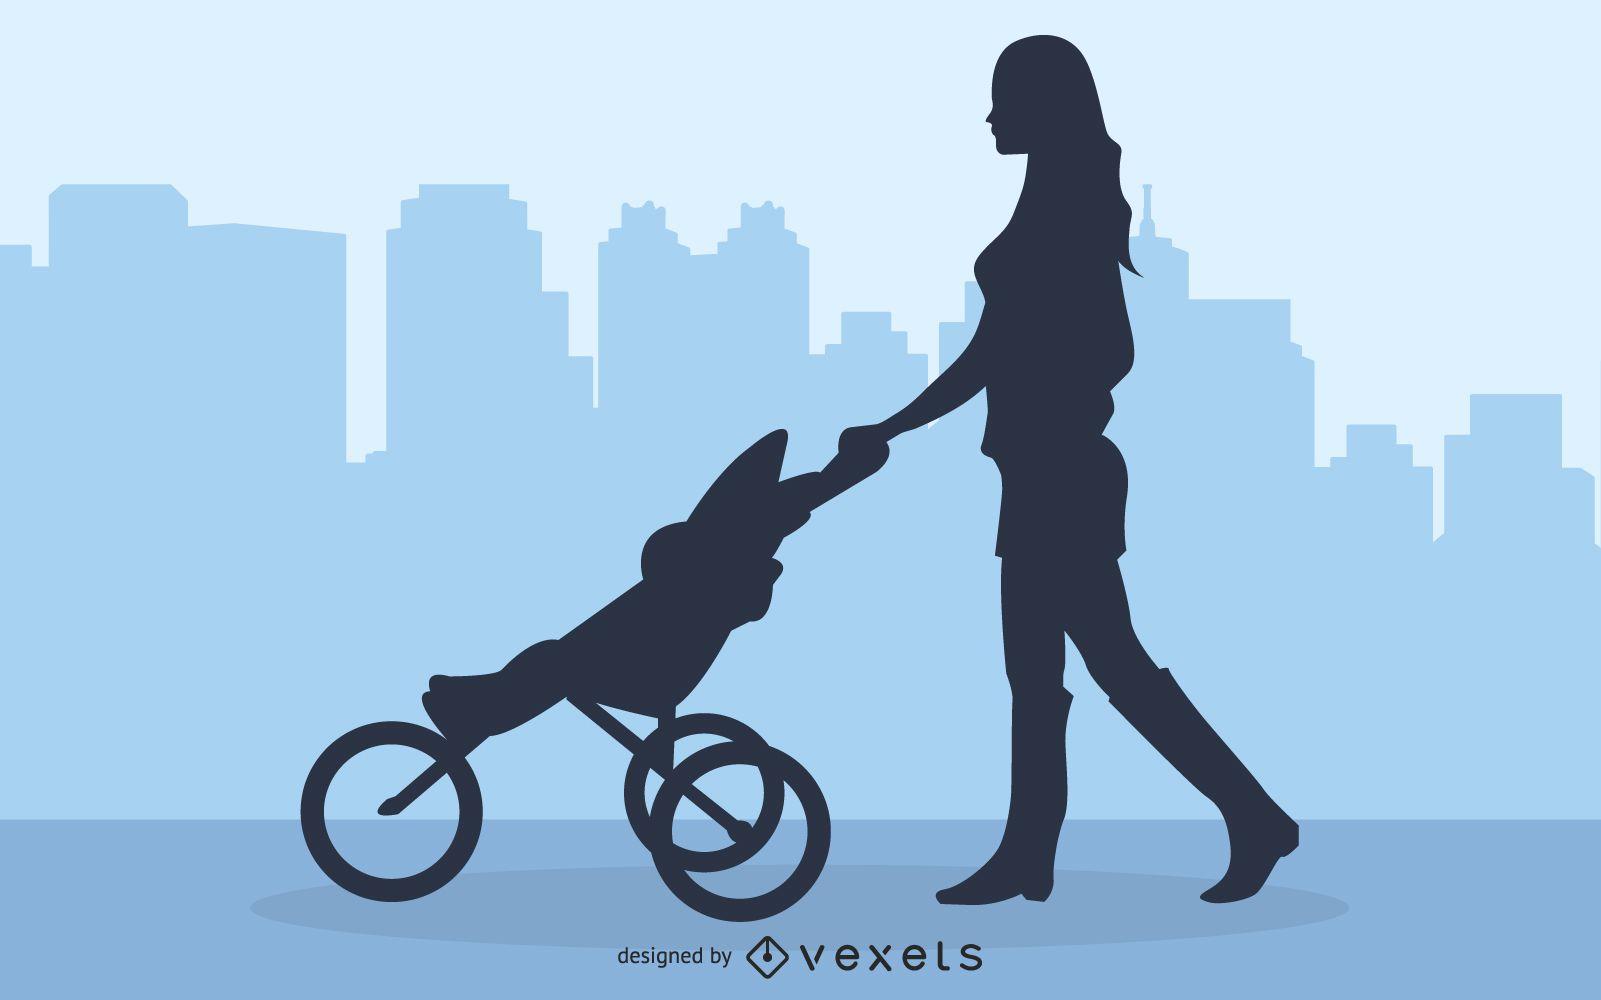 Mami caminando con cochecito de bebé